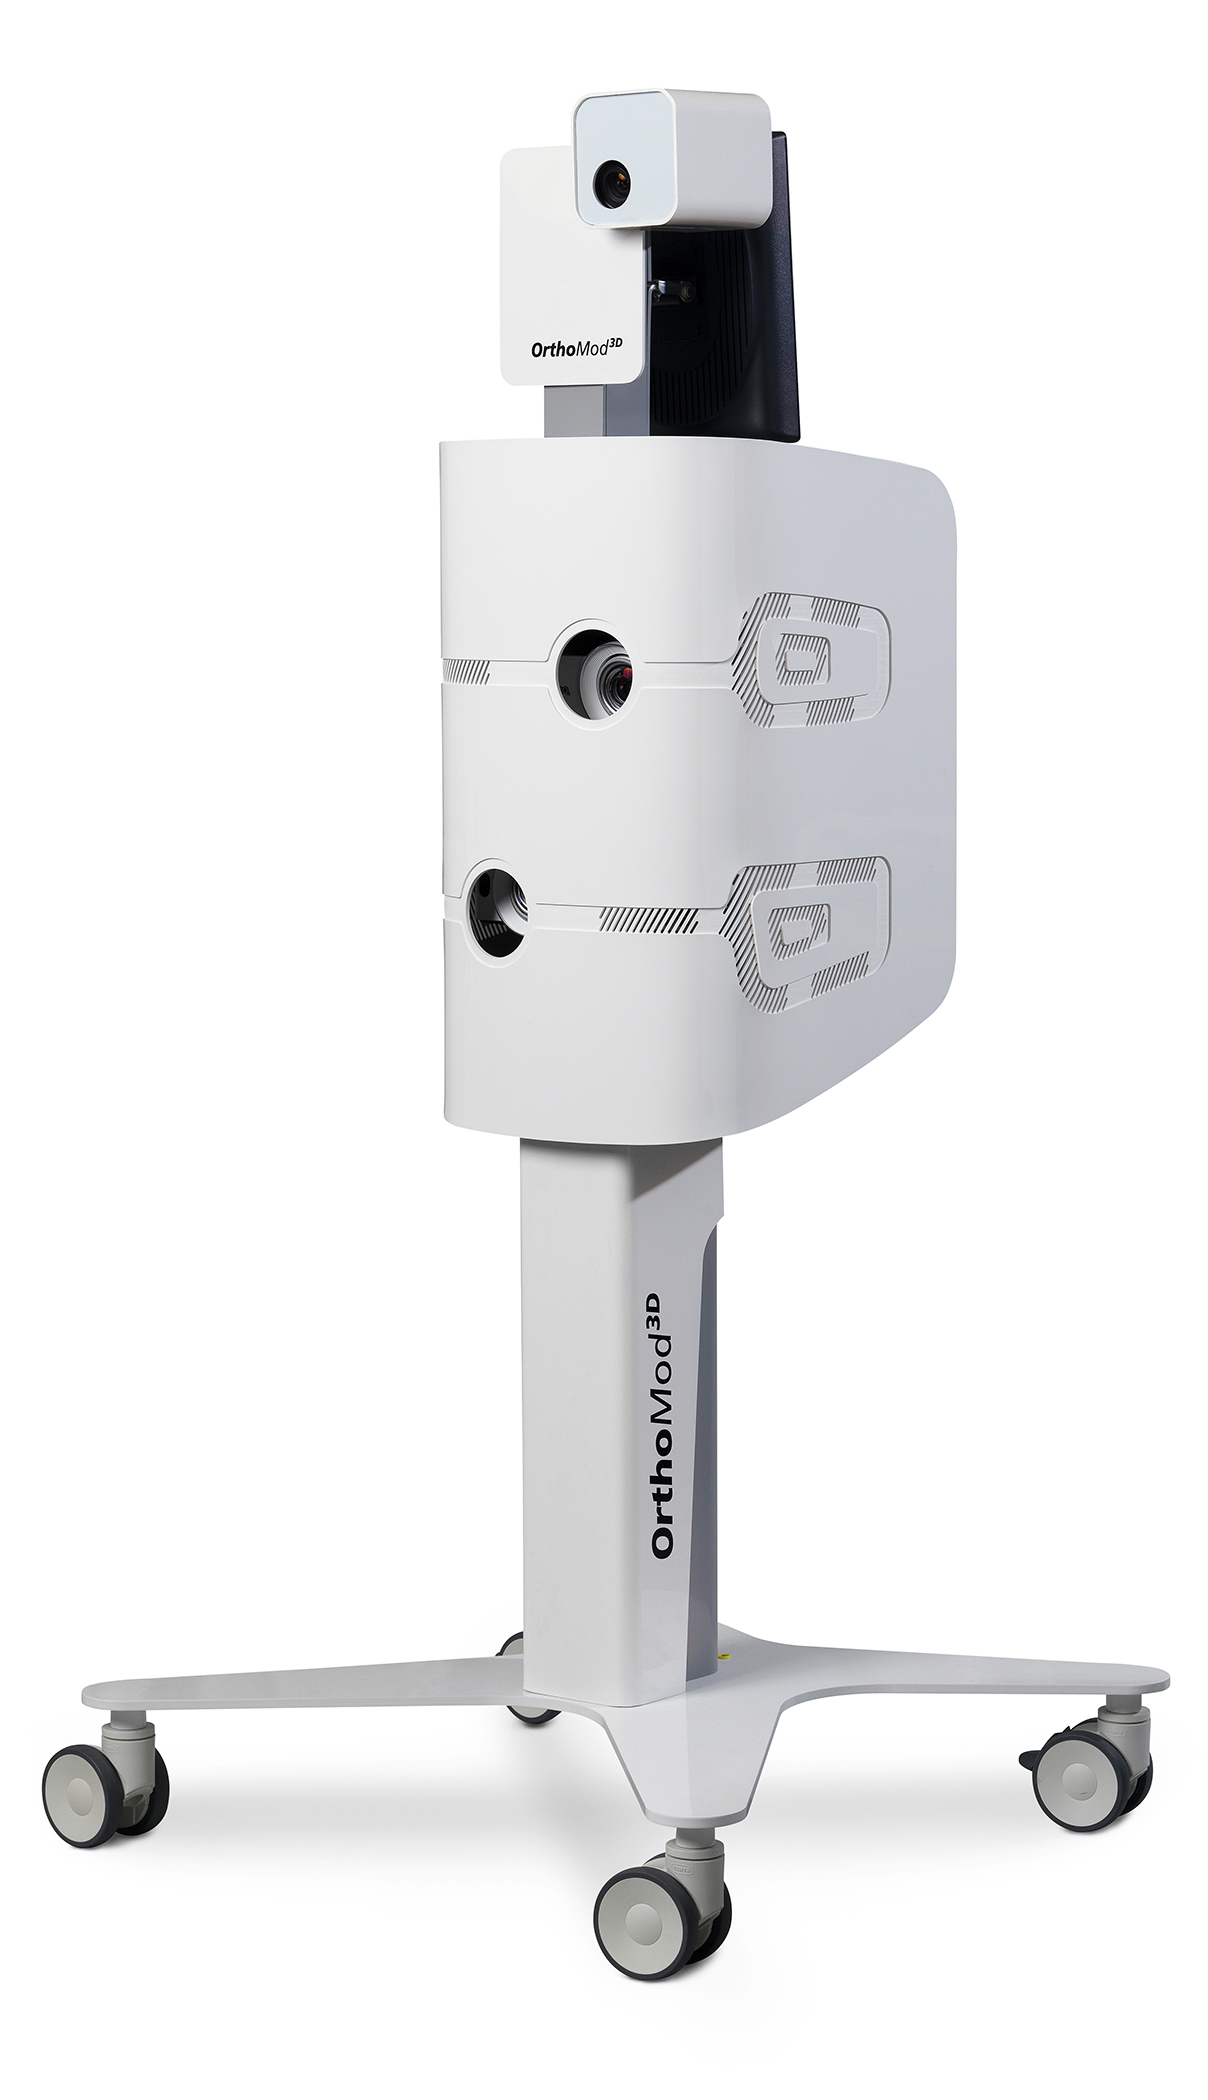 Canon Orthomod 3d For 3d Spine Assessment Canon Medical Deutschland